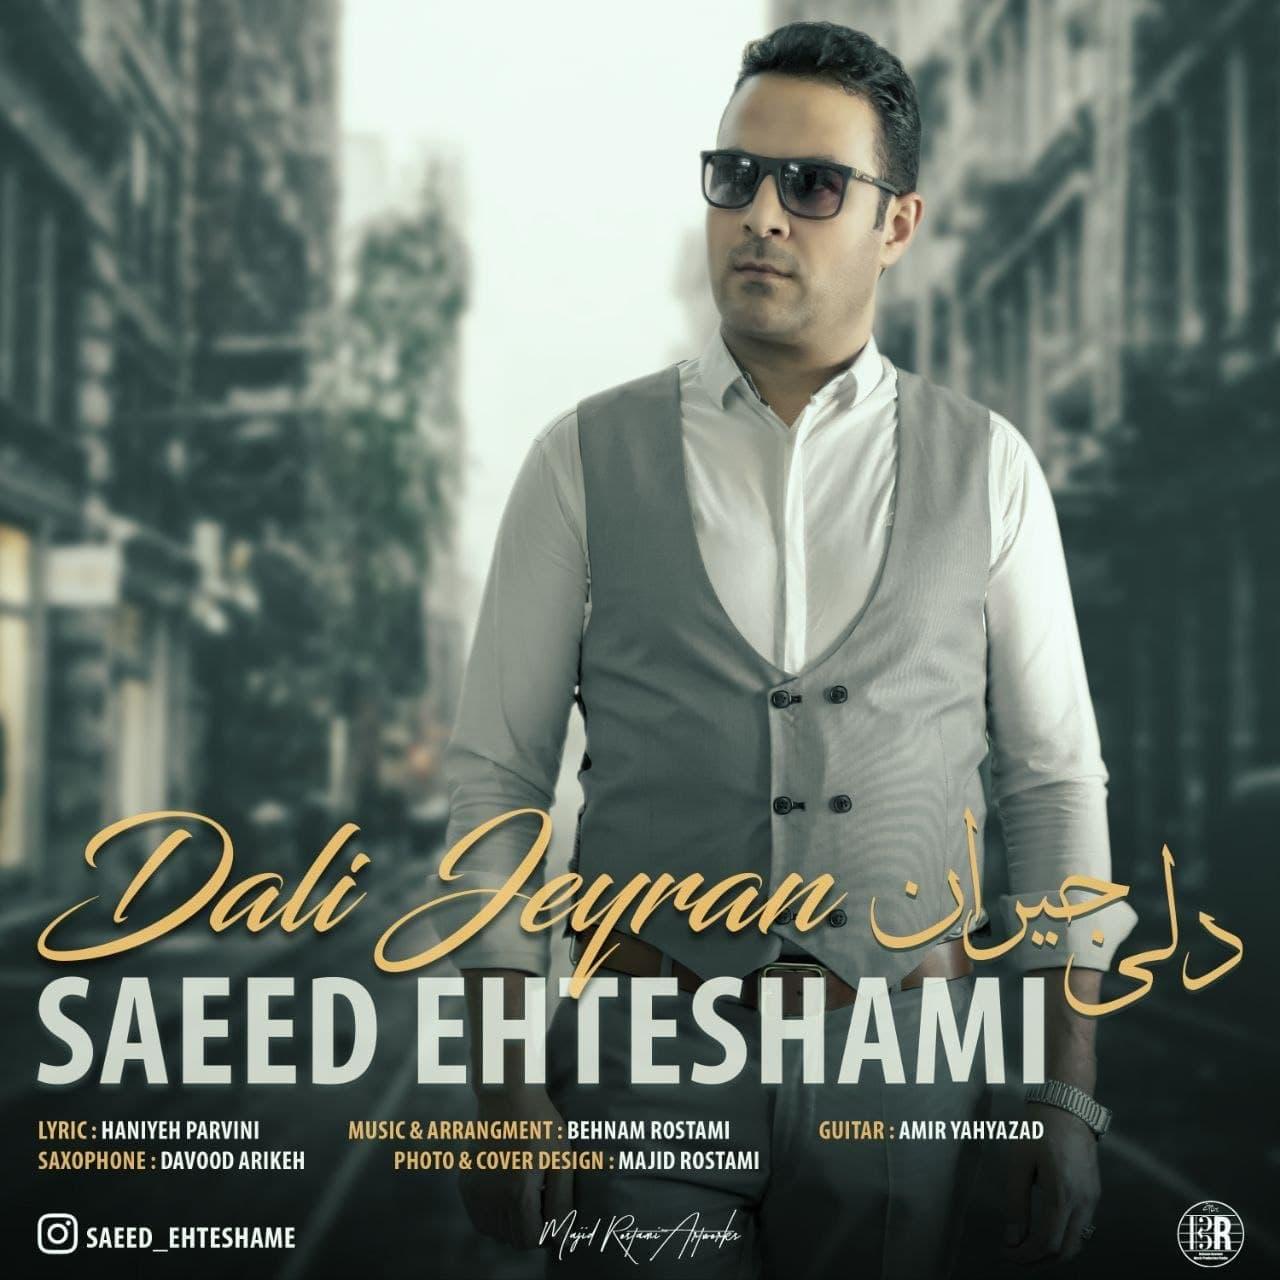 https://s18.picofile.com/file/8438485392/19Saeed_Ehteshami_Dali_Jeyran.jpg